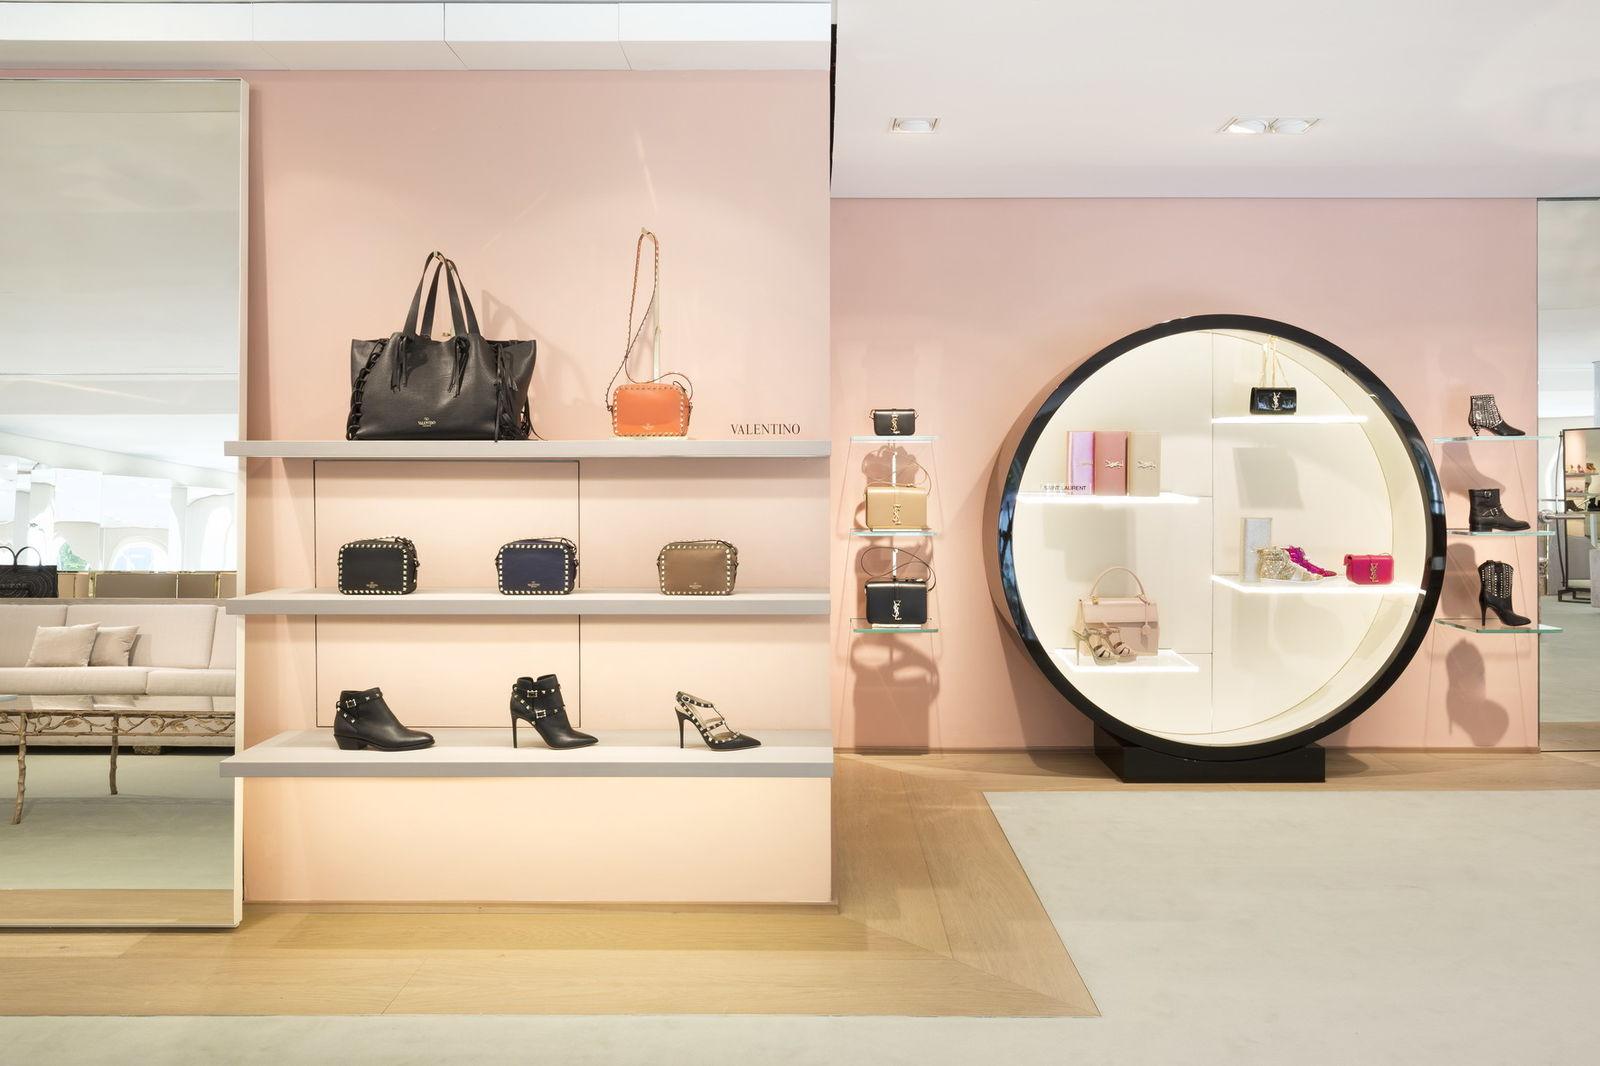 APROPOS The Concept Store in Hamburg (Bild 6)